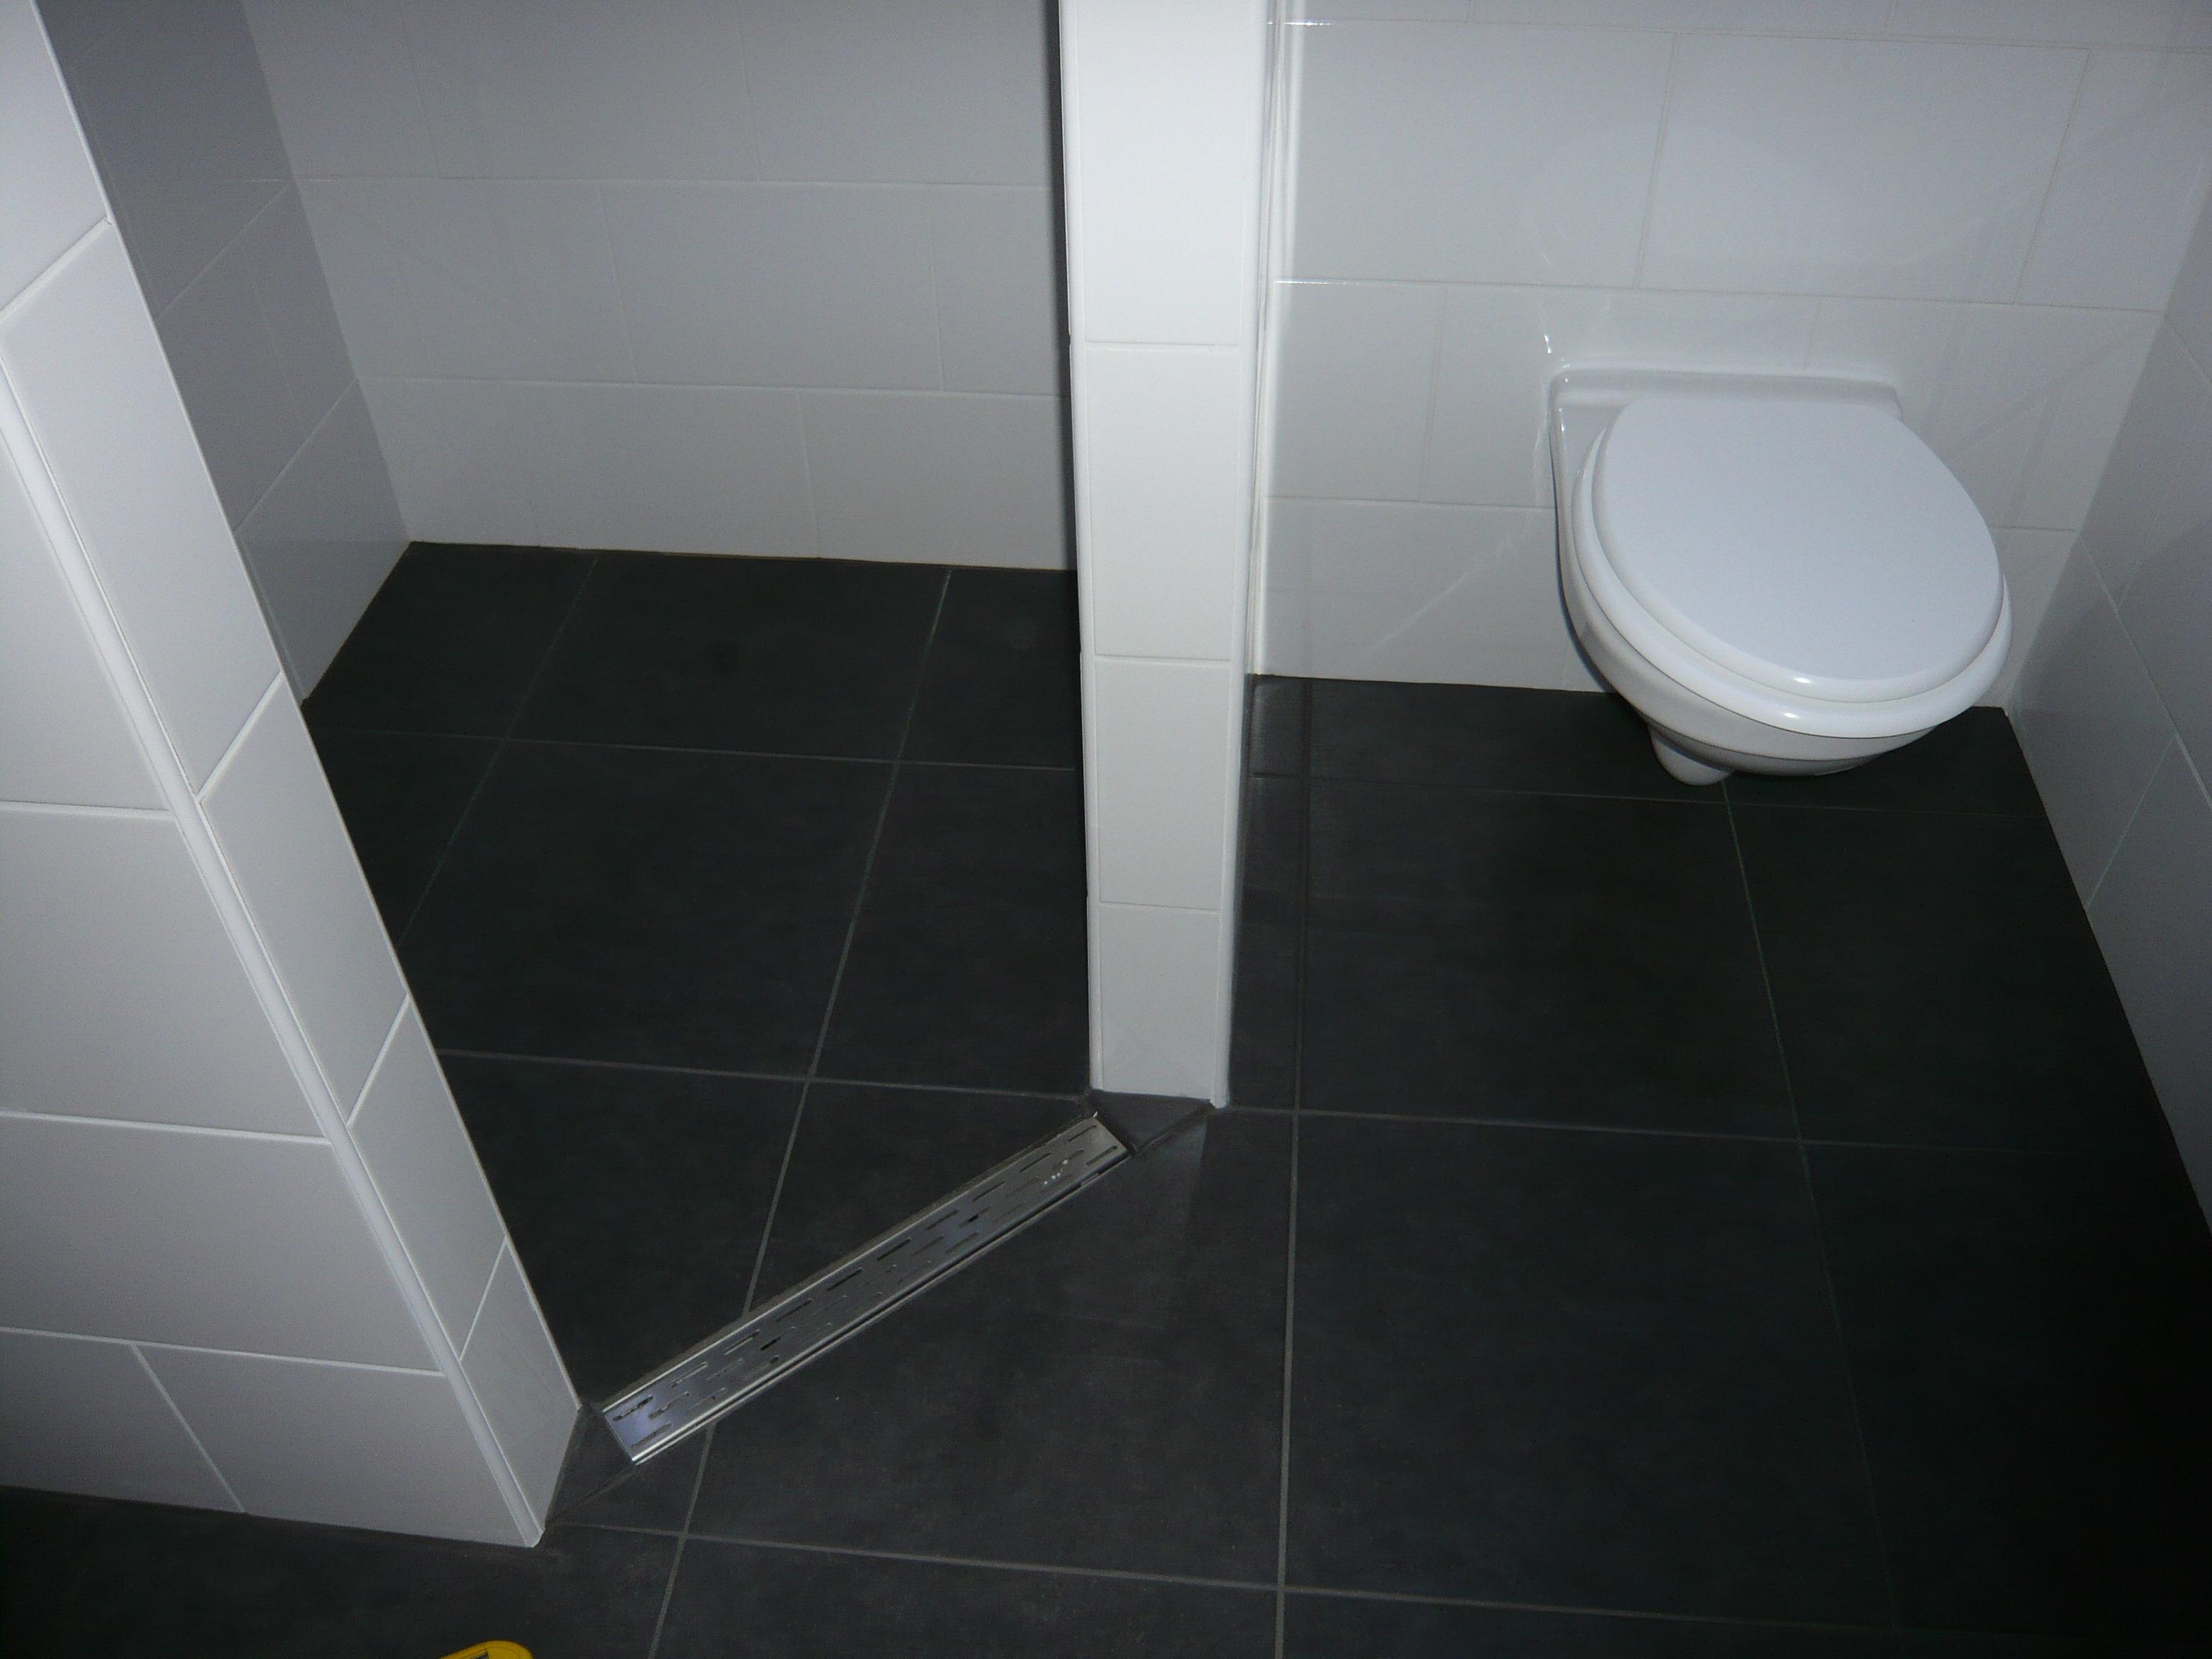 Badkamers Groningen Osloweg : Badkamer groningen klus en timmerbedrijf